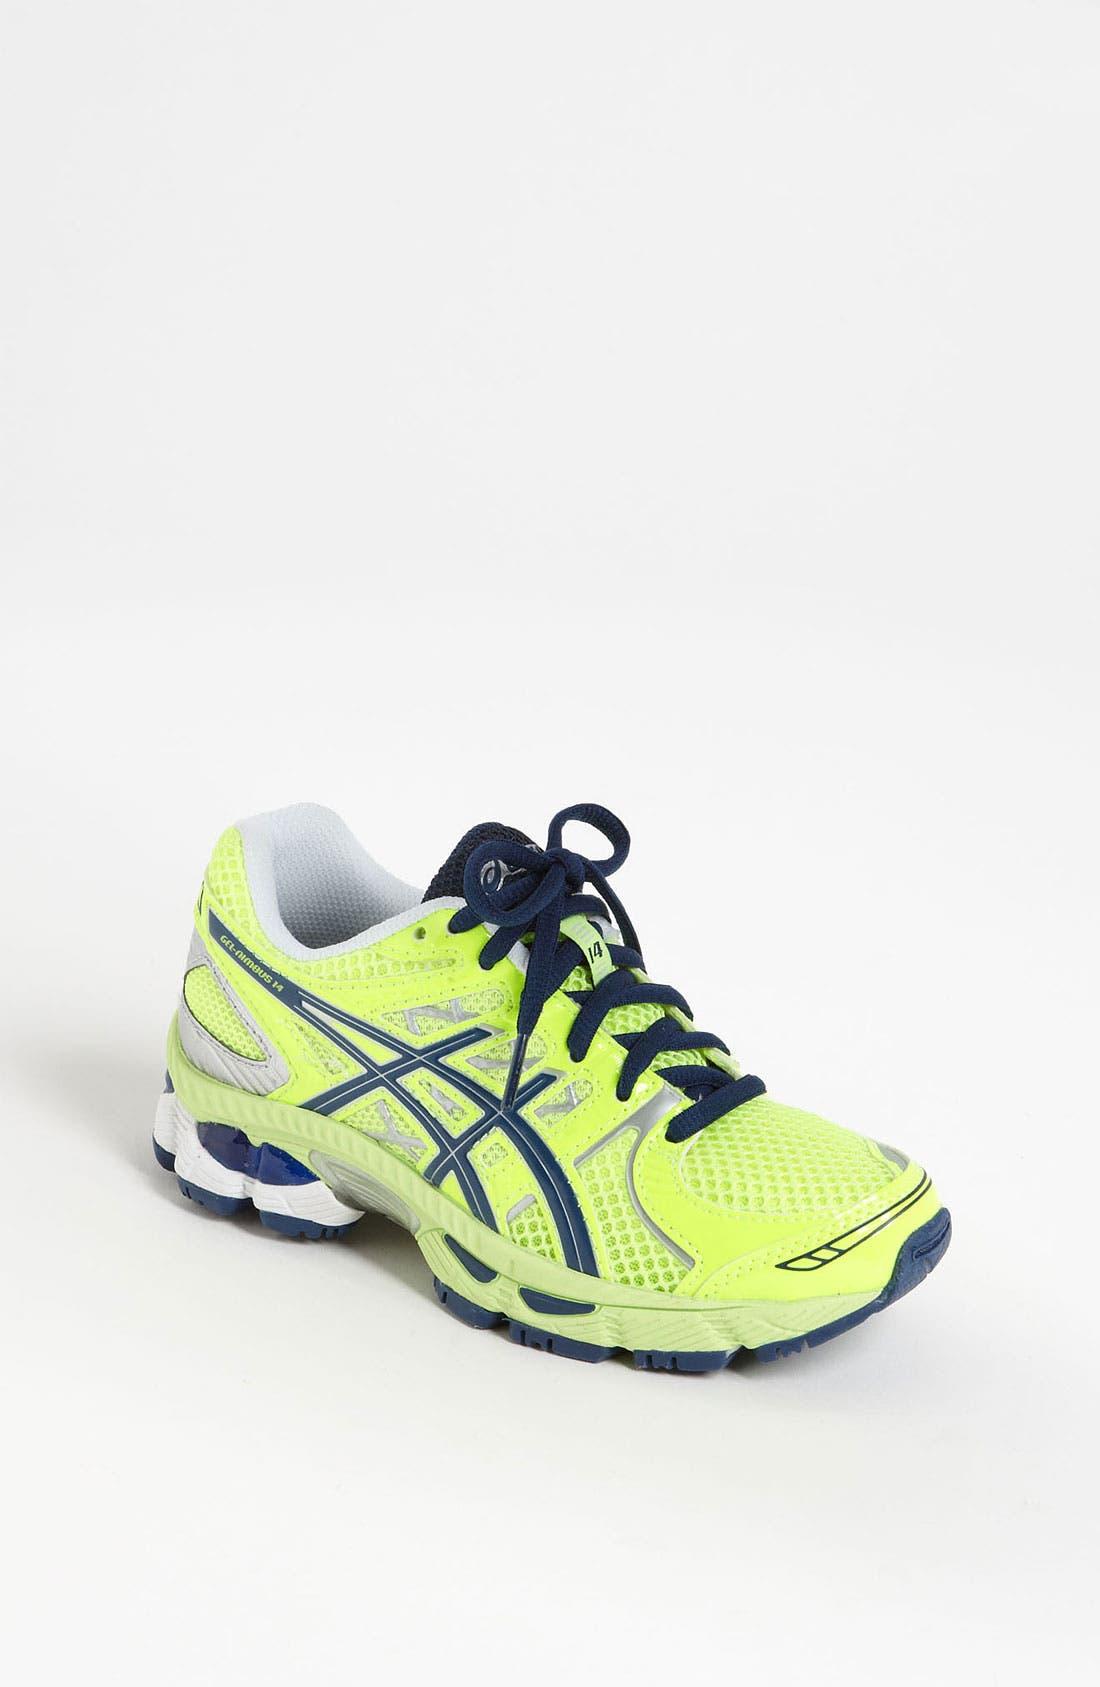 Alternate Image 1 Selected - ASICS® 'GEL®-Nimbus 14' Running Shoe (Little Kid & Big Kid)